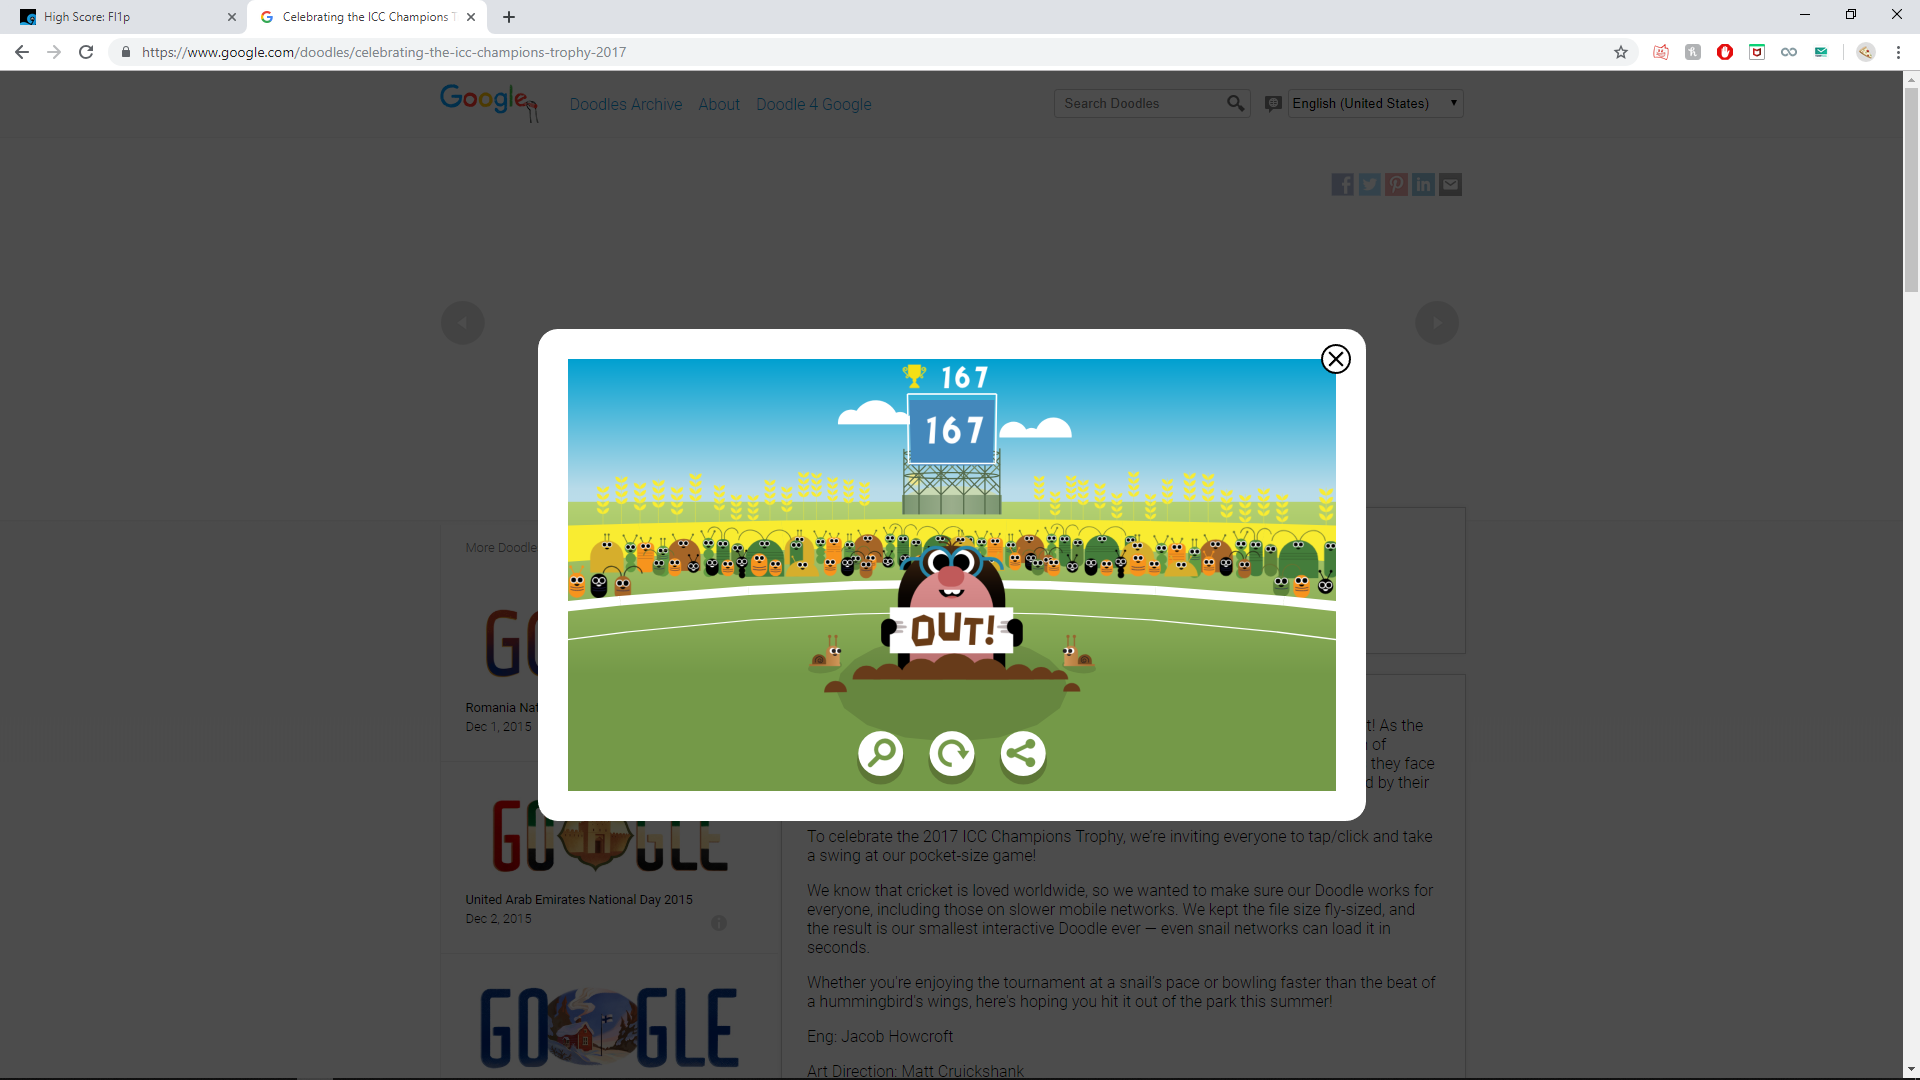 Google Doodle Cricket 167 points